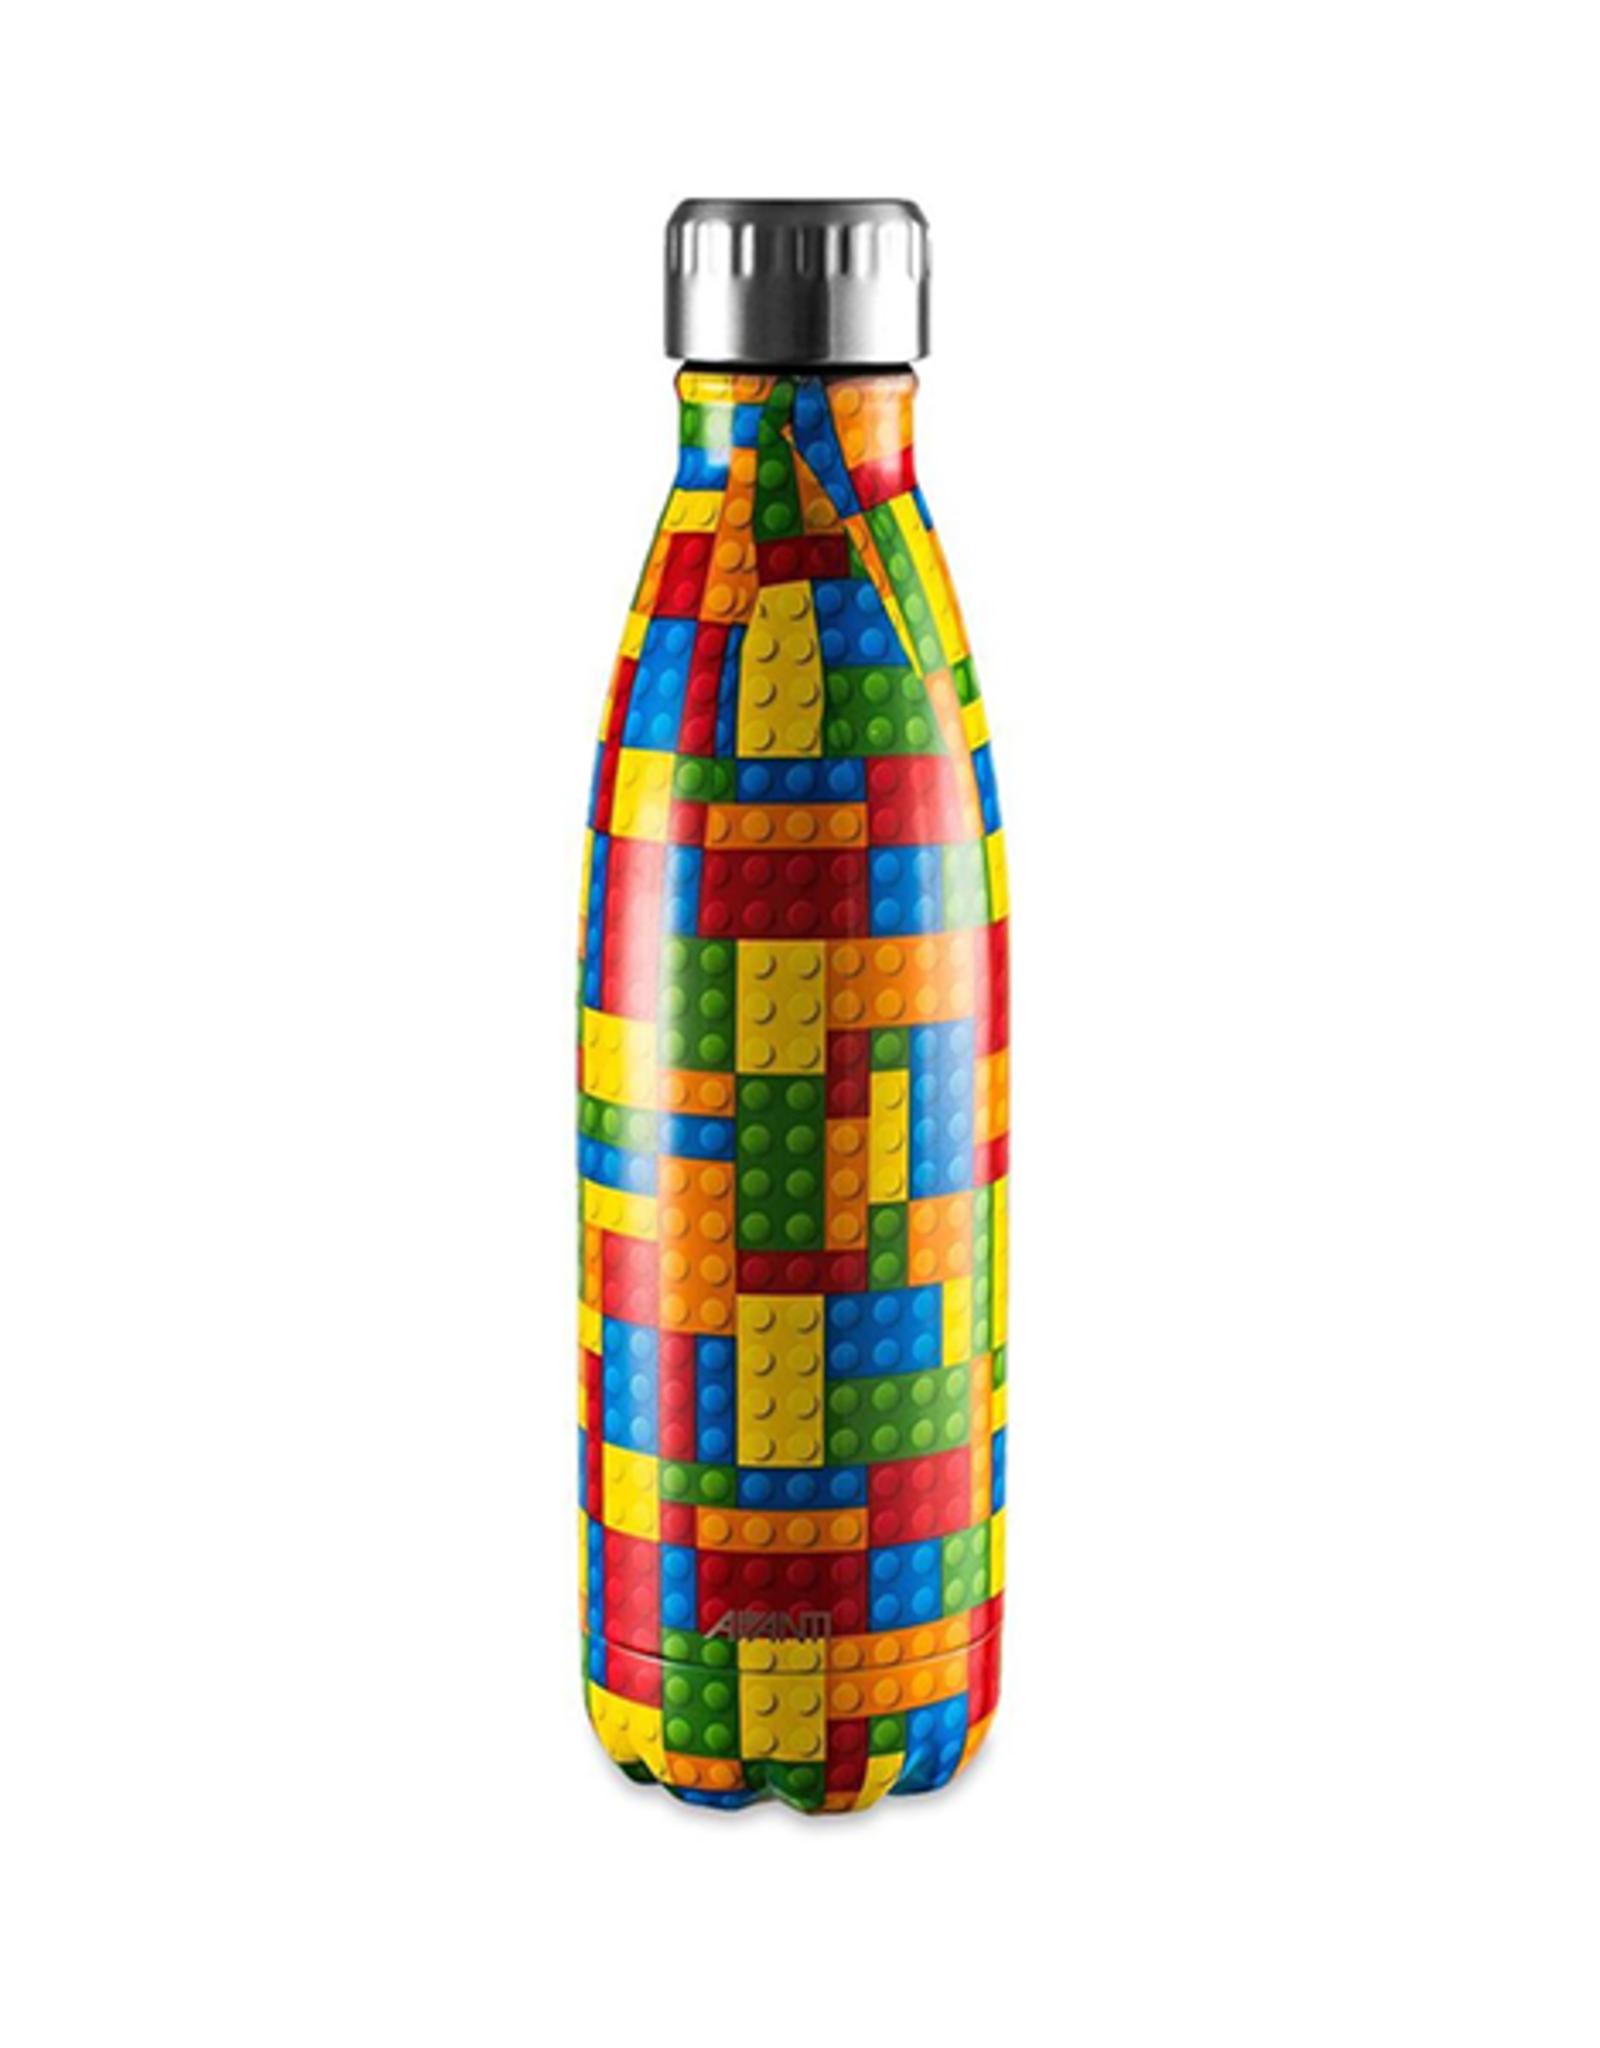 Avanti Homewares Fluid Bottle 500ml - Building Blocks